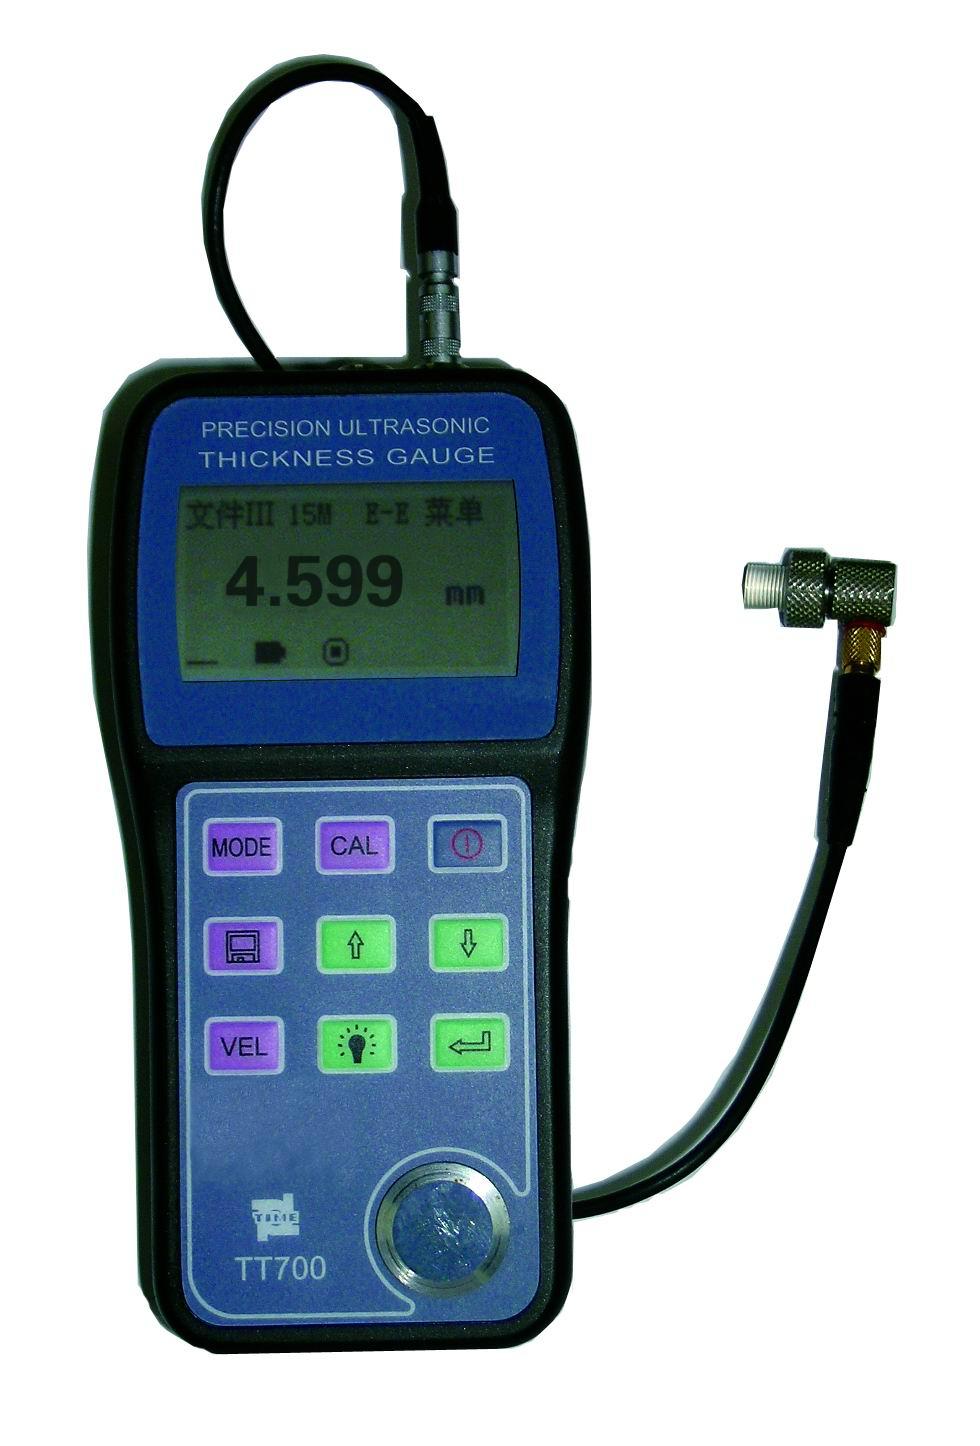 Precise Model  TT700  ULTRASONIC THICKNESS GAUGE